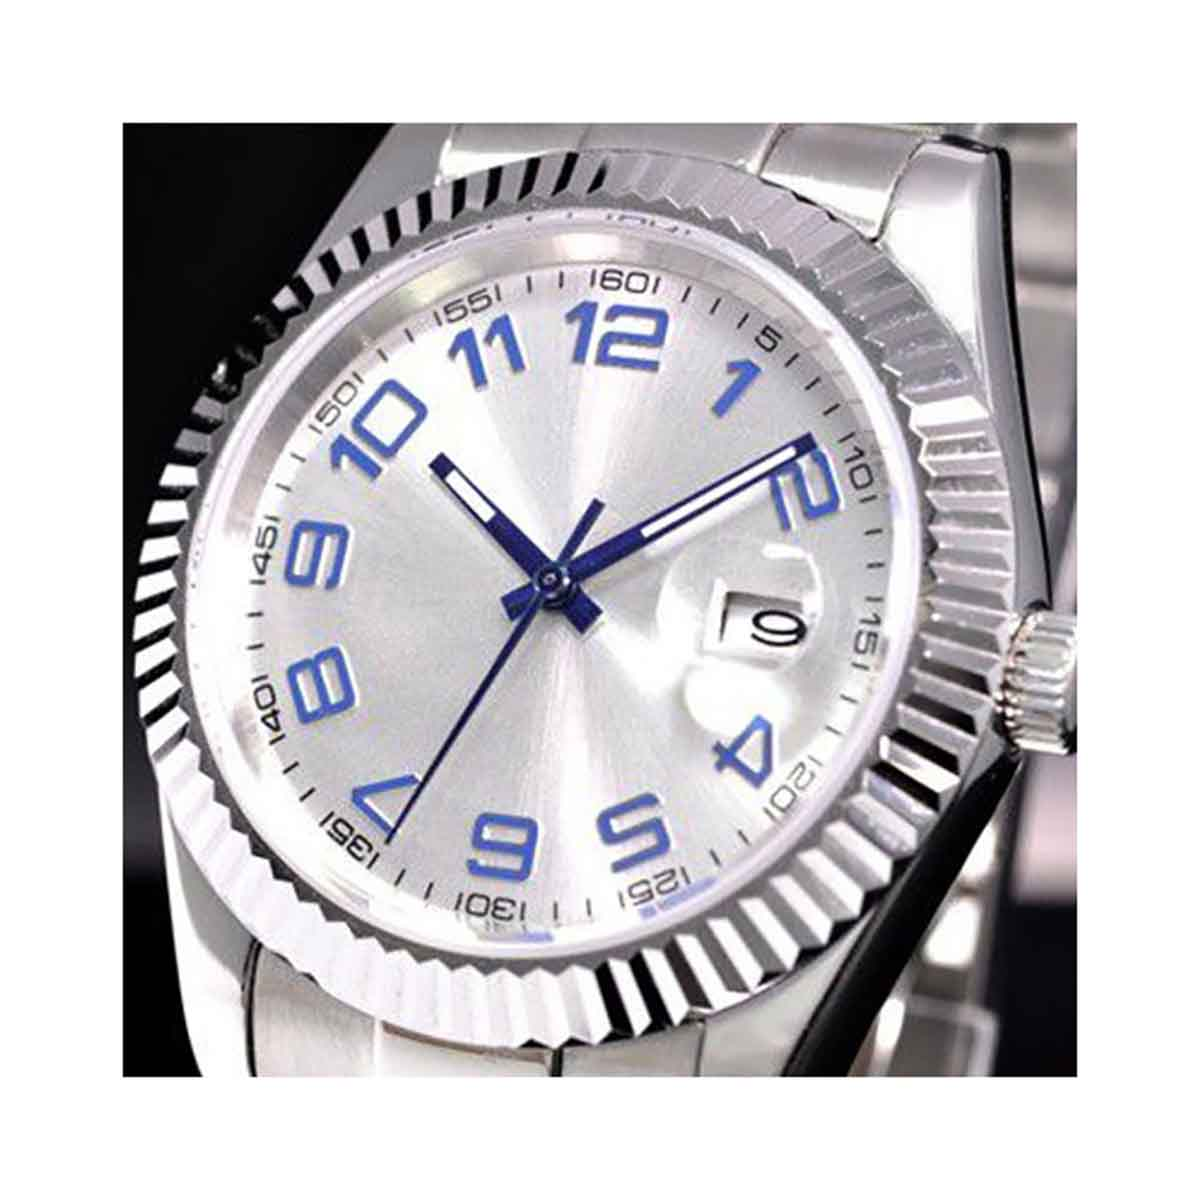 NOLOGO ノーロゴ 自動巻き  腕時計 メンズ [NL-036SW3AS] 並行輸入品 メーカー保証24ヶ月【新生活応援】 メンズウォッチ おしゃれ 腕時計/夜行表示/防水機能 防水時計/カレンダー デイトユニークな形状